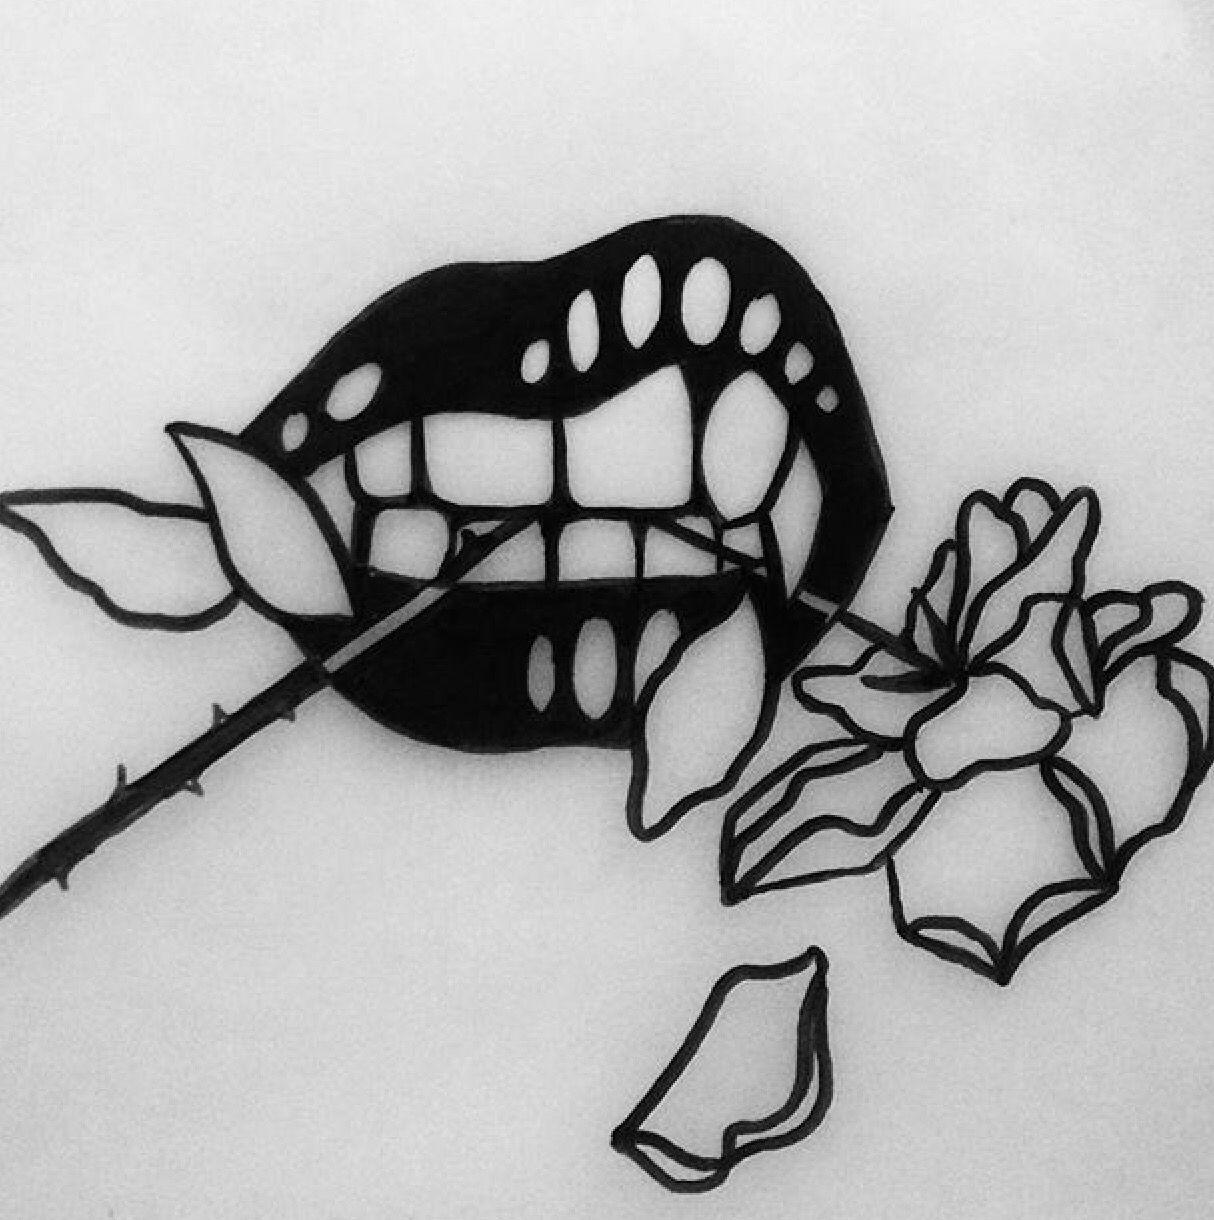 Piercing above lip to the side  Johny gloom u this would be a great side rib tattoo u  Ķēēp cåłm